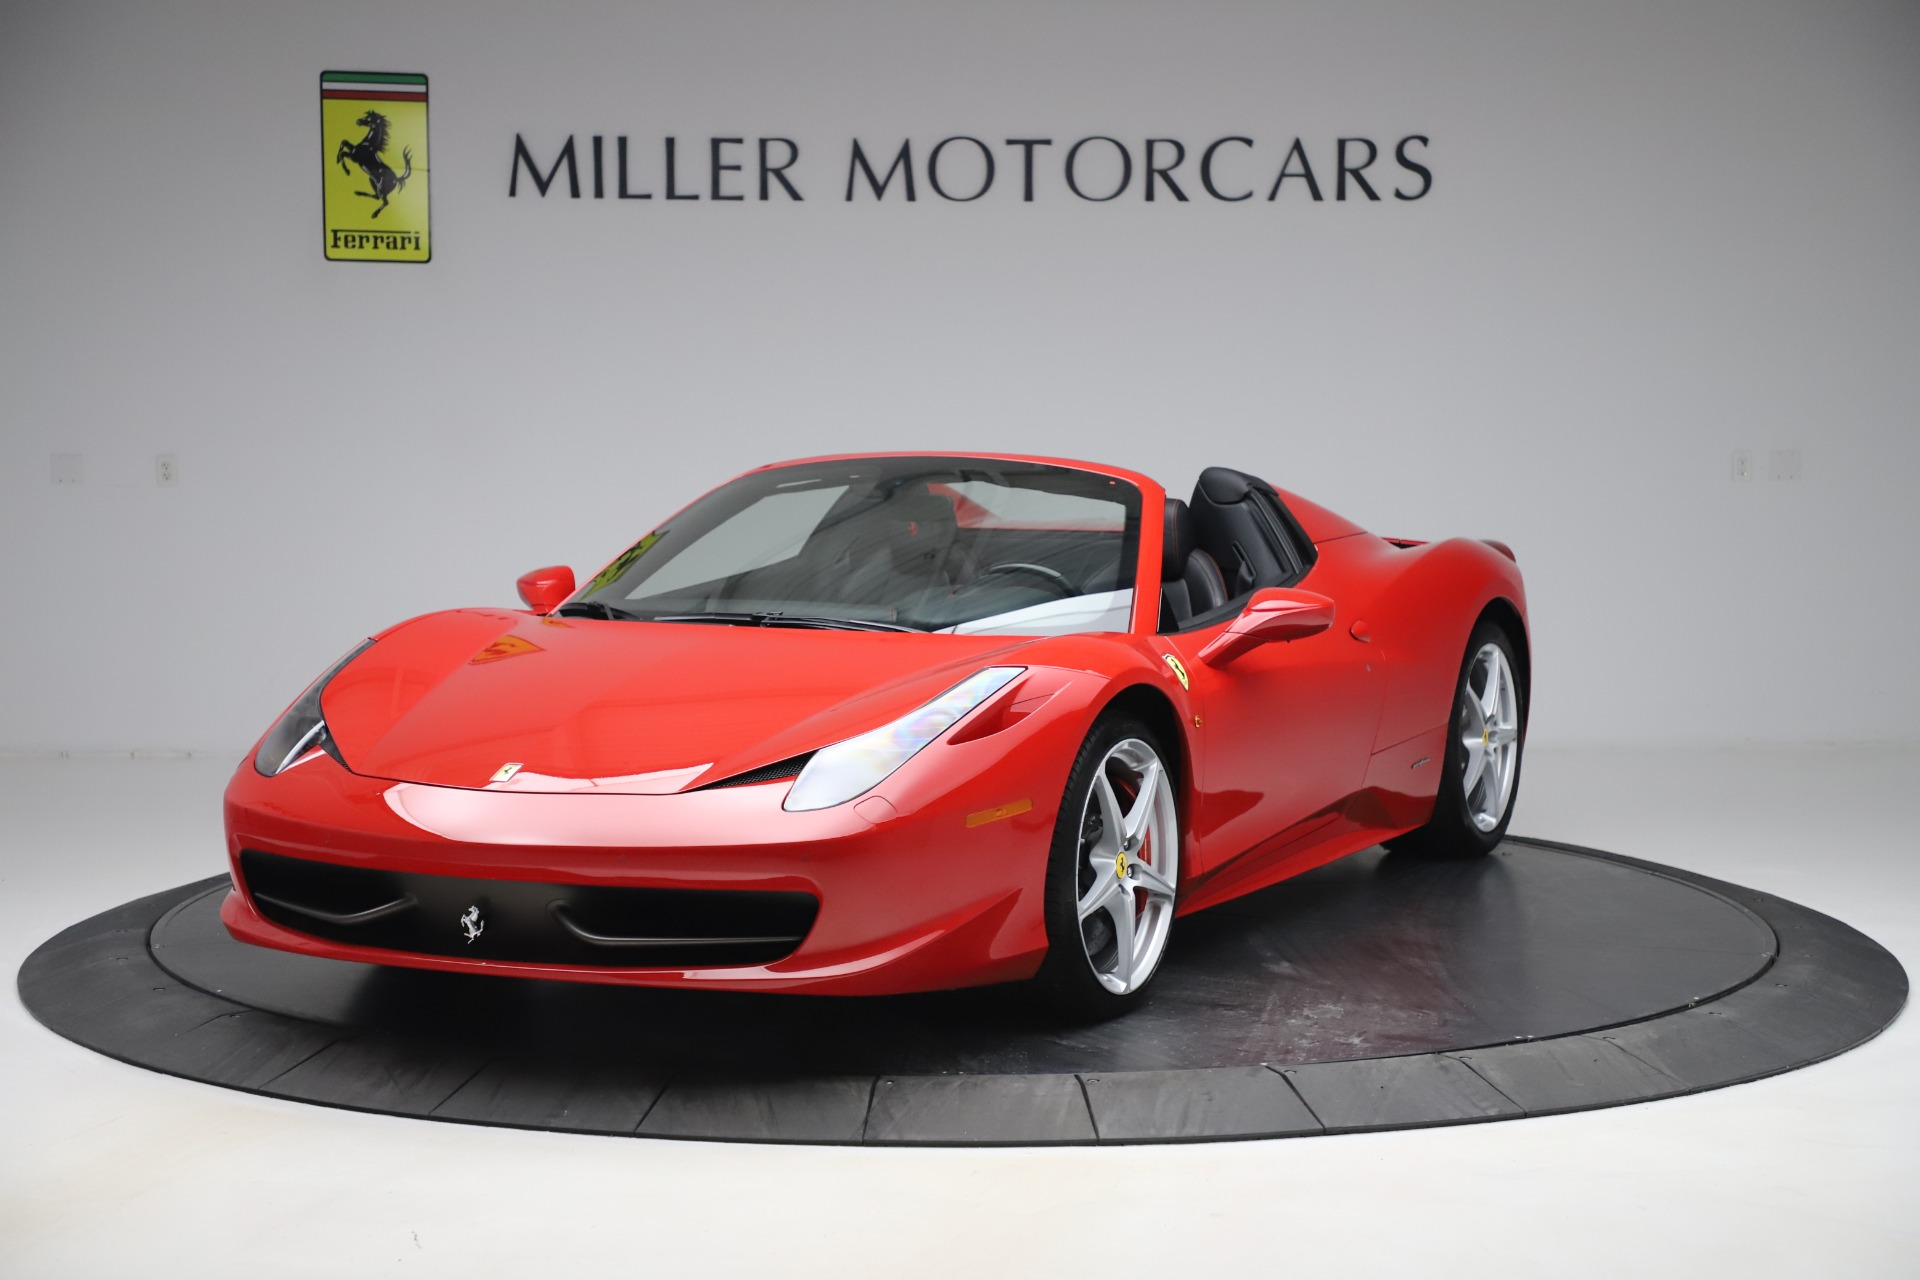 Used 2015 Ferrari 458 Spider for sale $235,900 at Alfa Romeo of Westport in Westport CT 06880 1